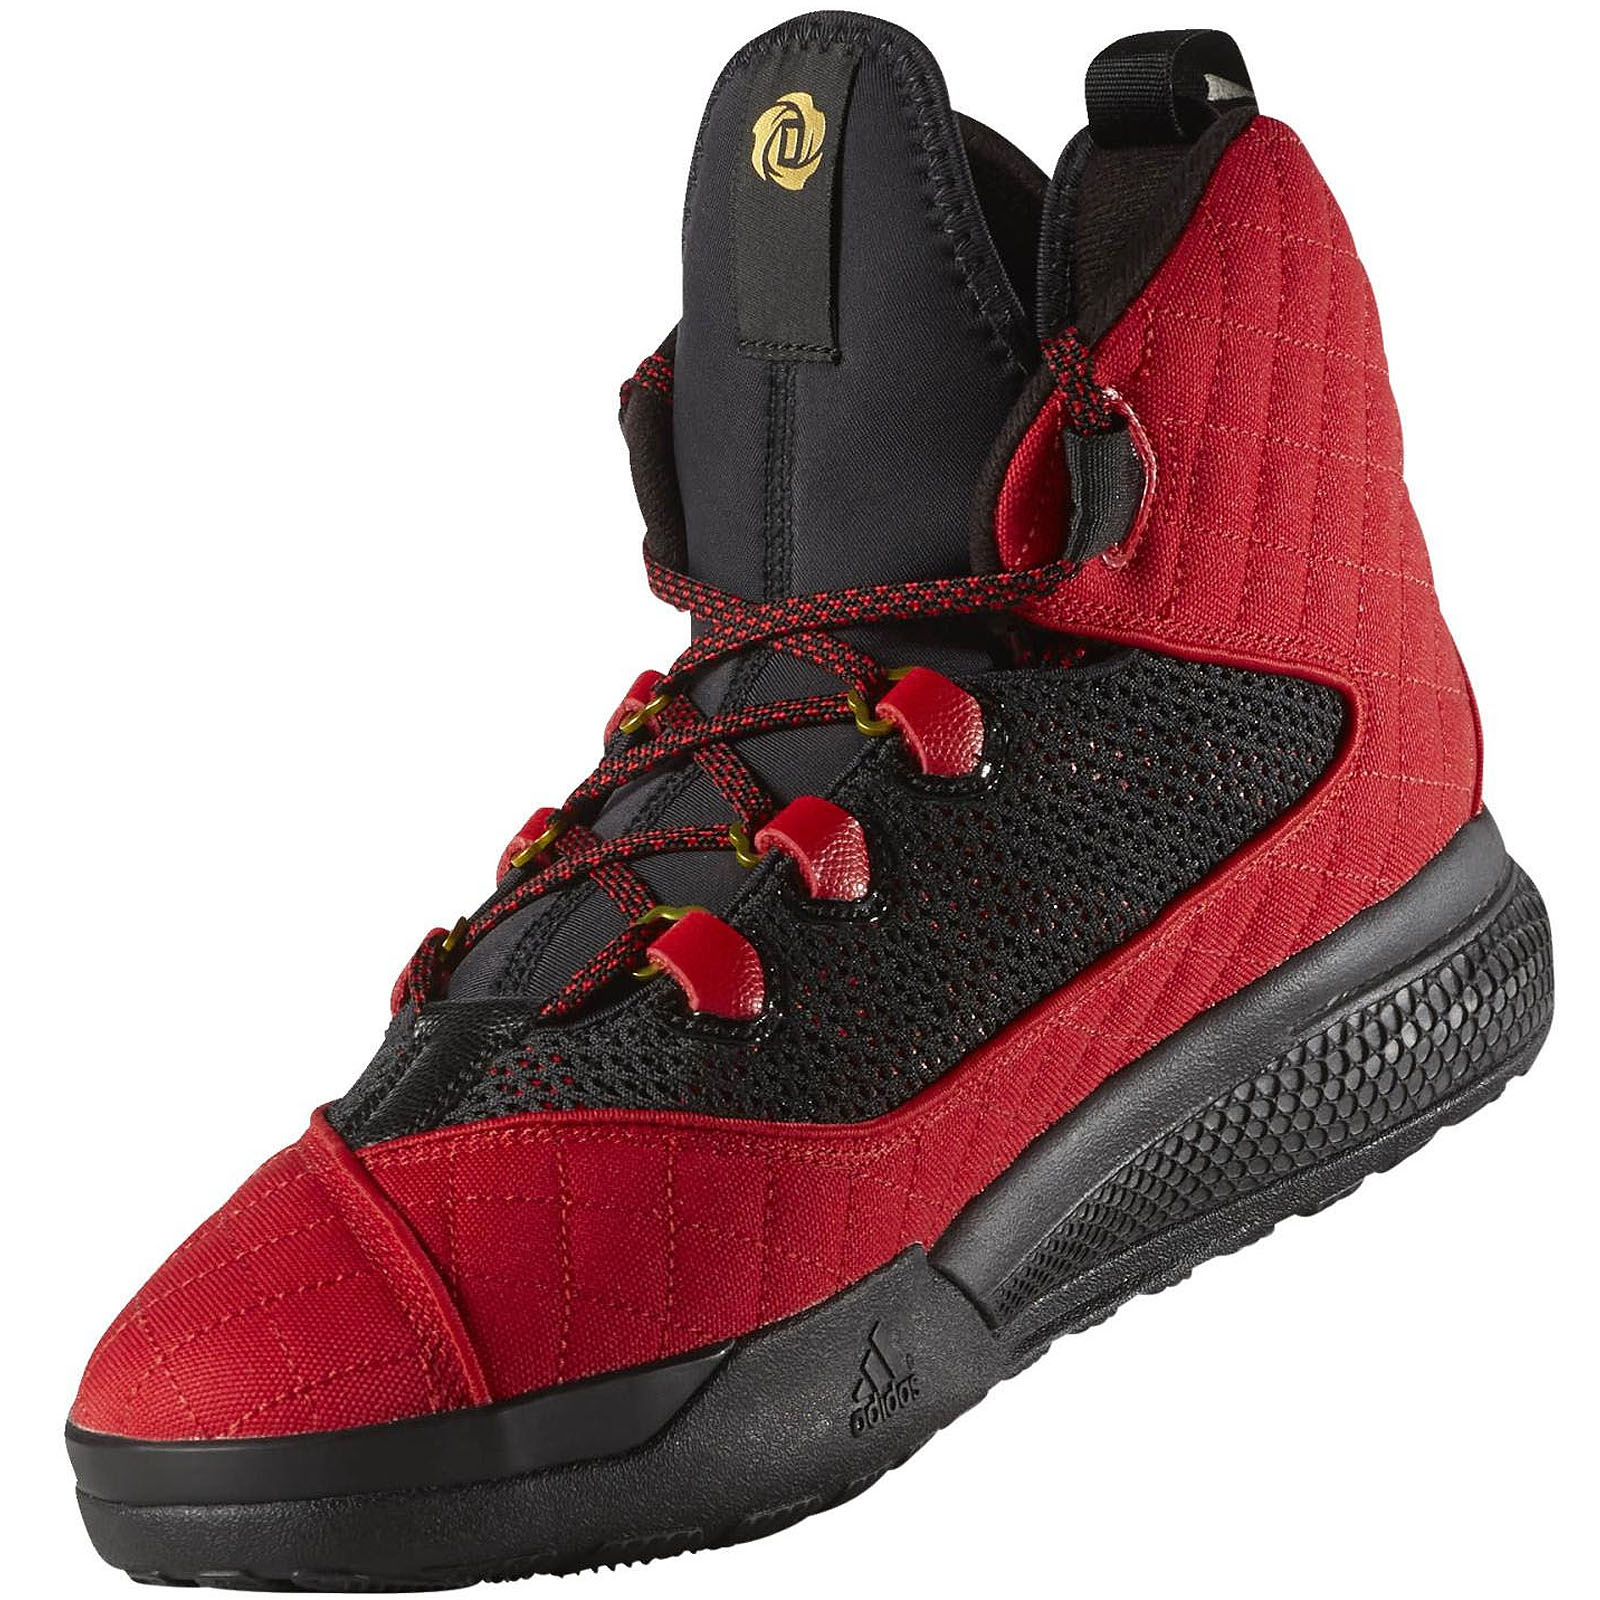 save off 8fe10 176d3 adidas-Performance-Mens-Derrick-Rose-Dominate-2016-Basketball-